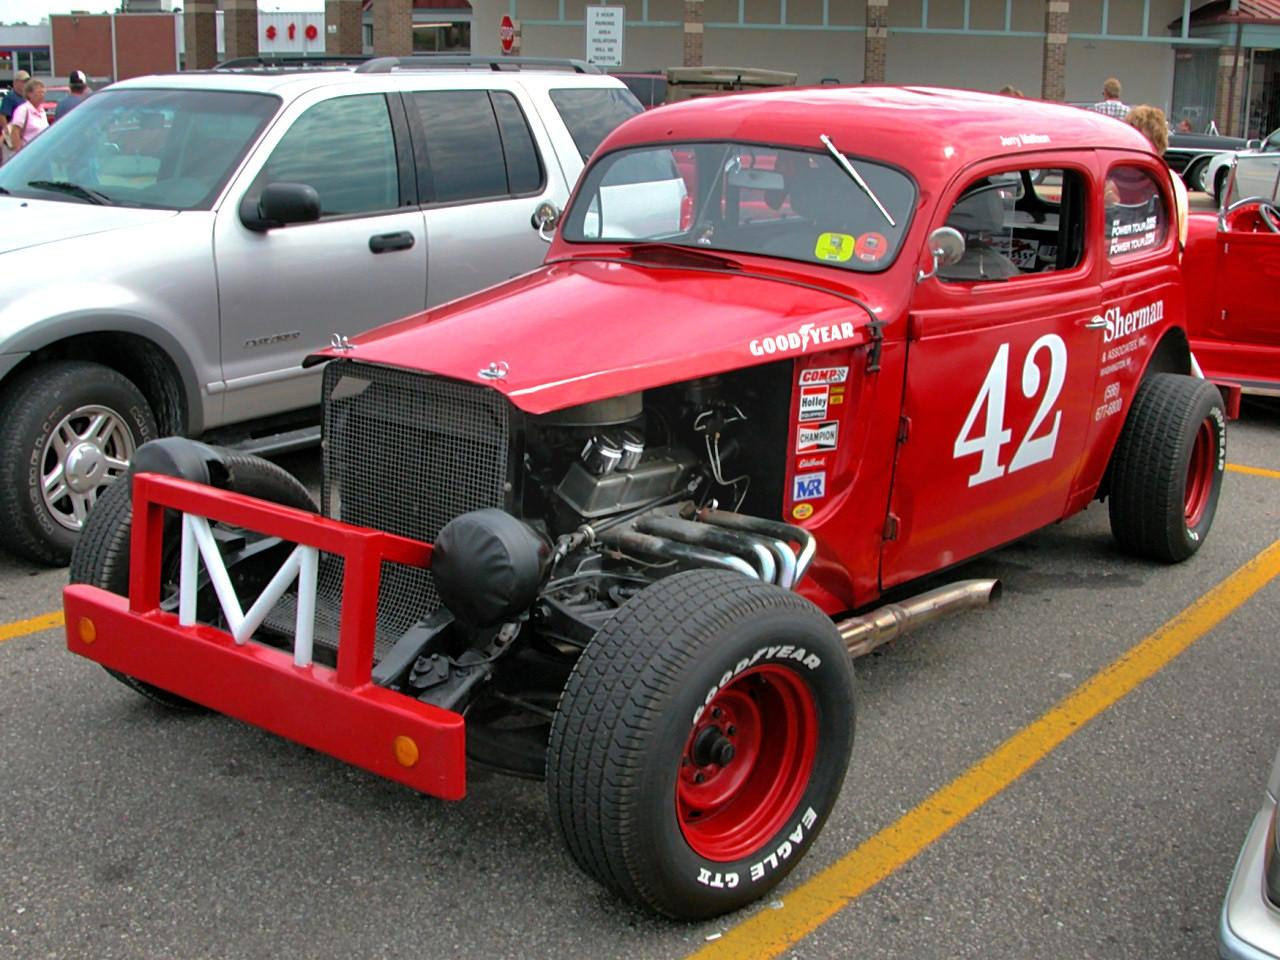 1939 Plymouth 2 Door Sedan Oval Track Race Car 196x Replica Chevrolet 350 Engine Fvl 2005 Dream Cruise N